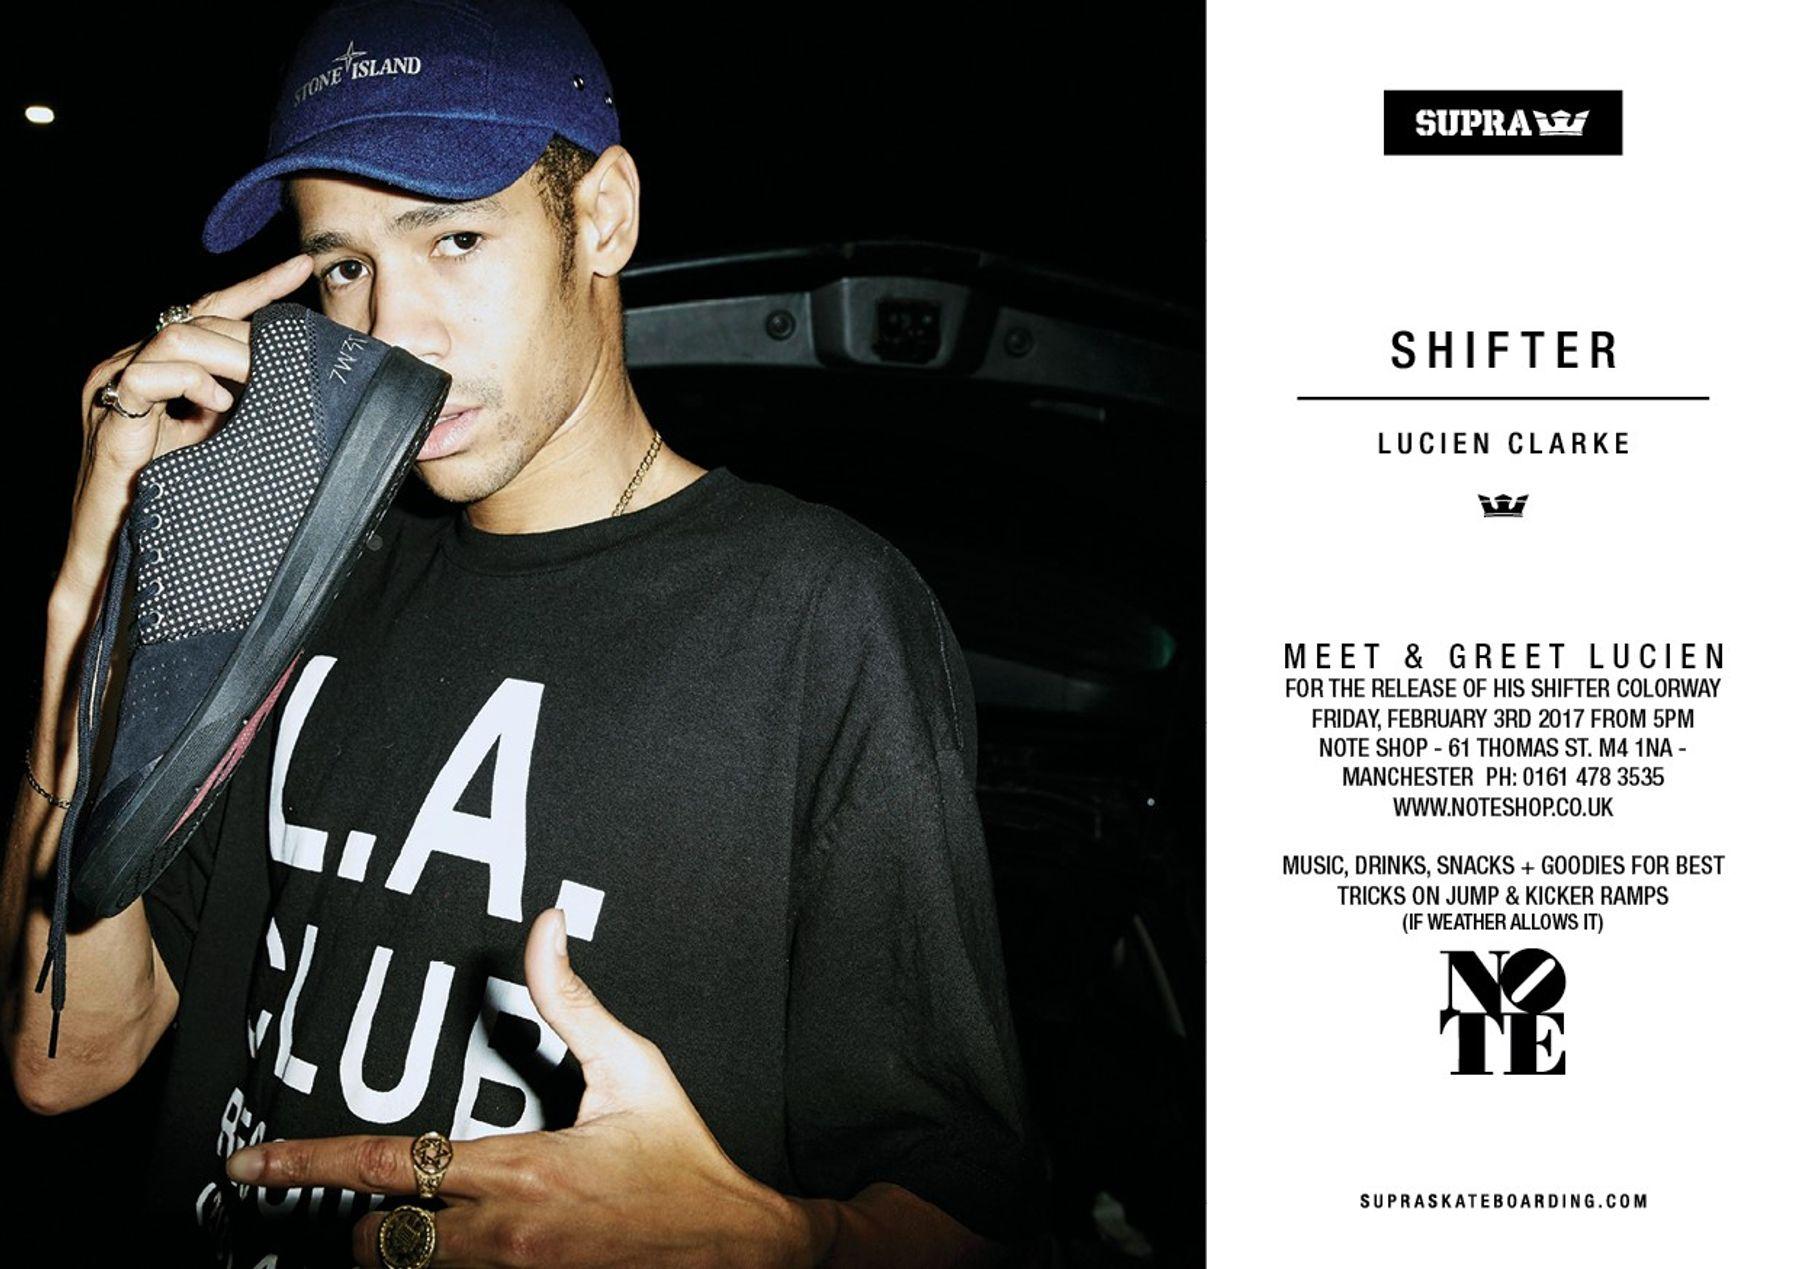 supra-x-note-shop-3rd-feb